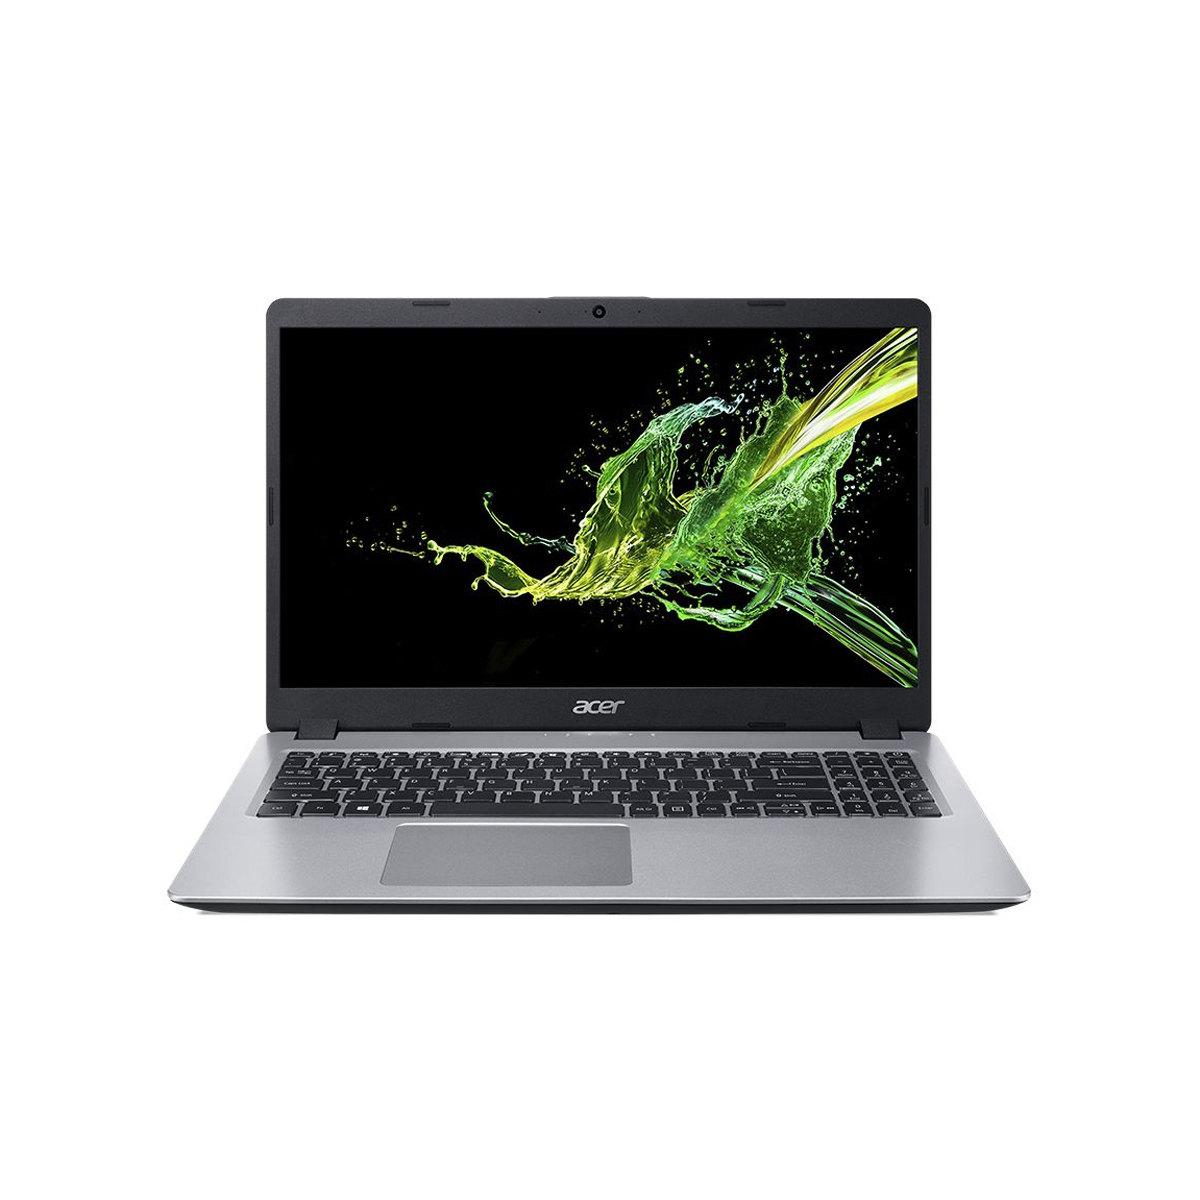 Notebook Acer A515 Core I5 8265u Memoria 8gb Ddr4 Hd 1tb Ssd 120gb Tela 15.6' Led Hd Sistema Windows 10 Home